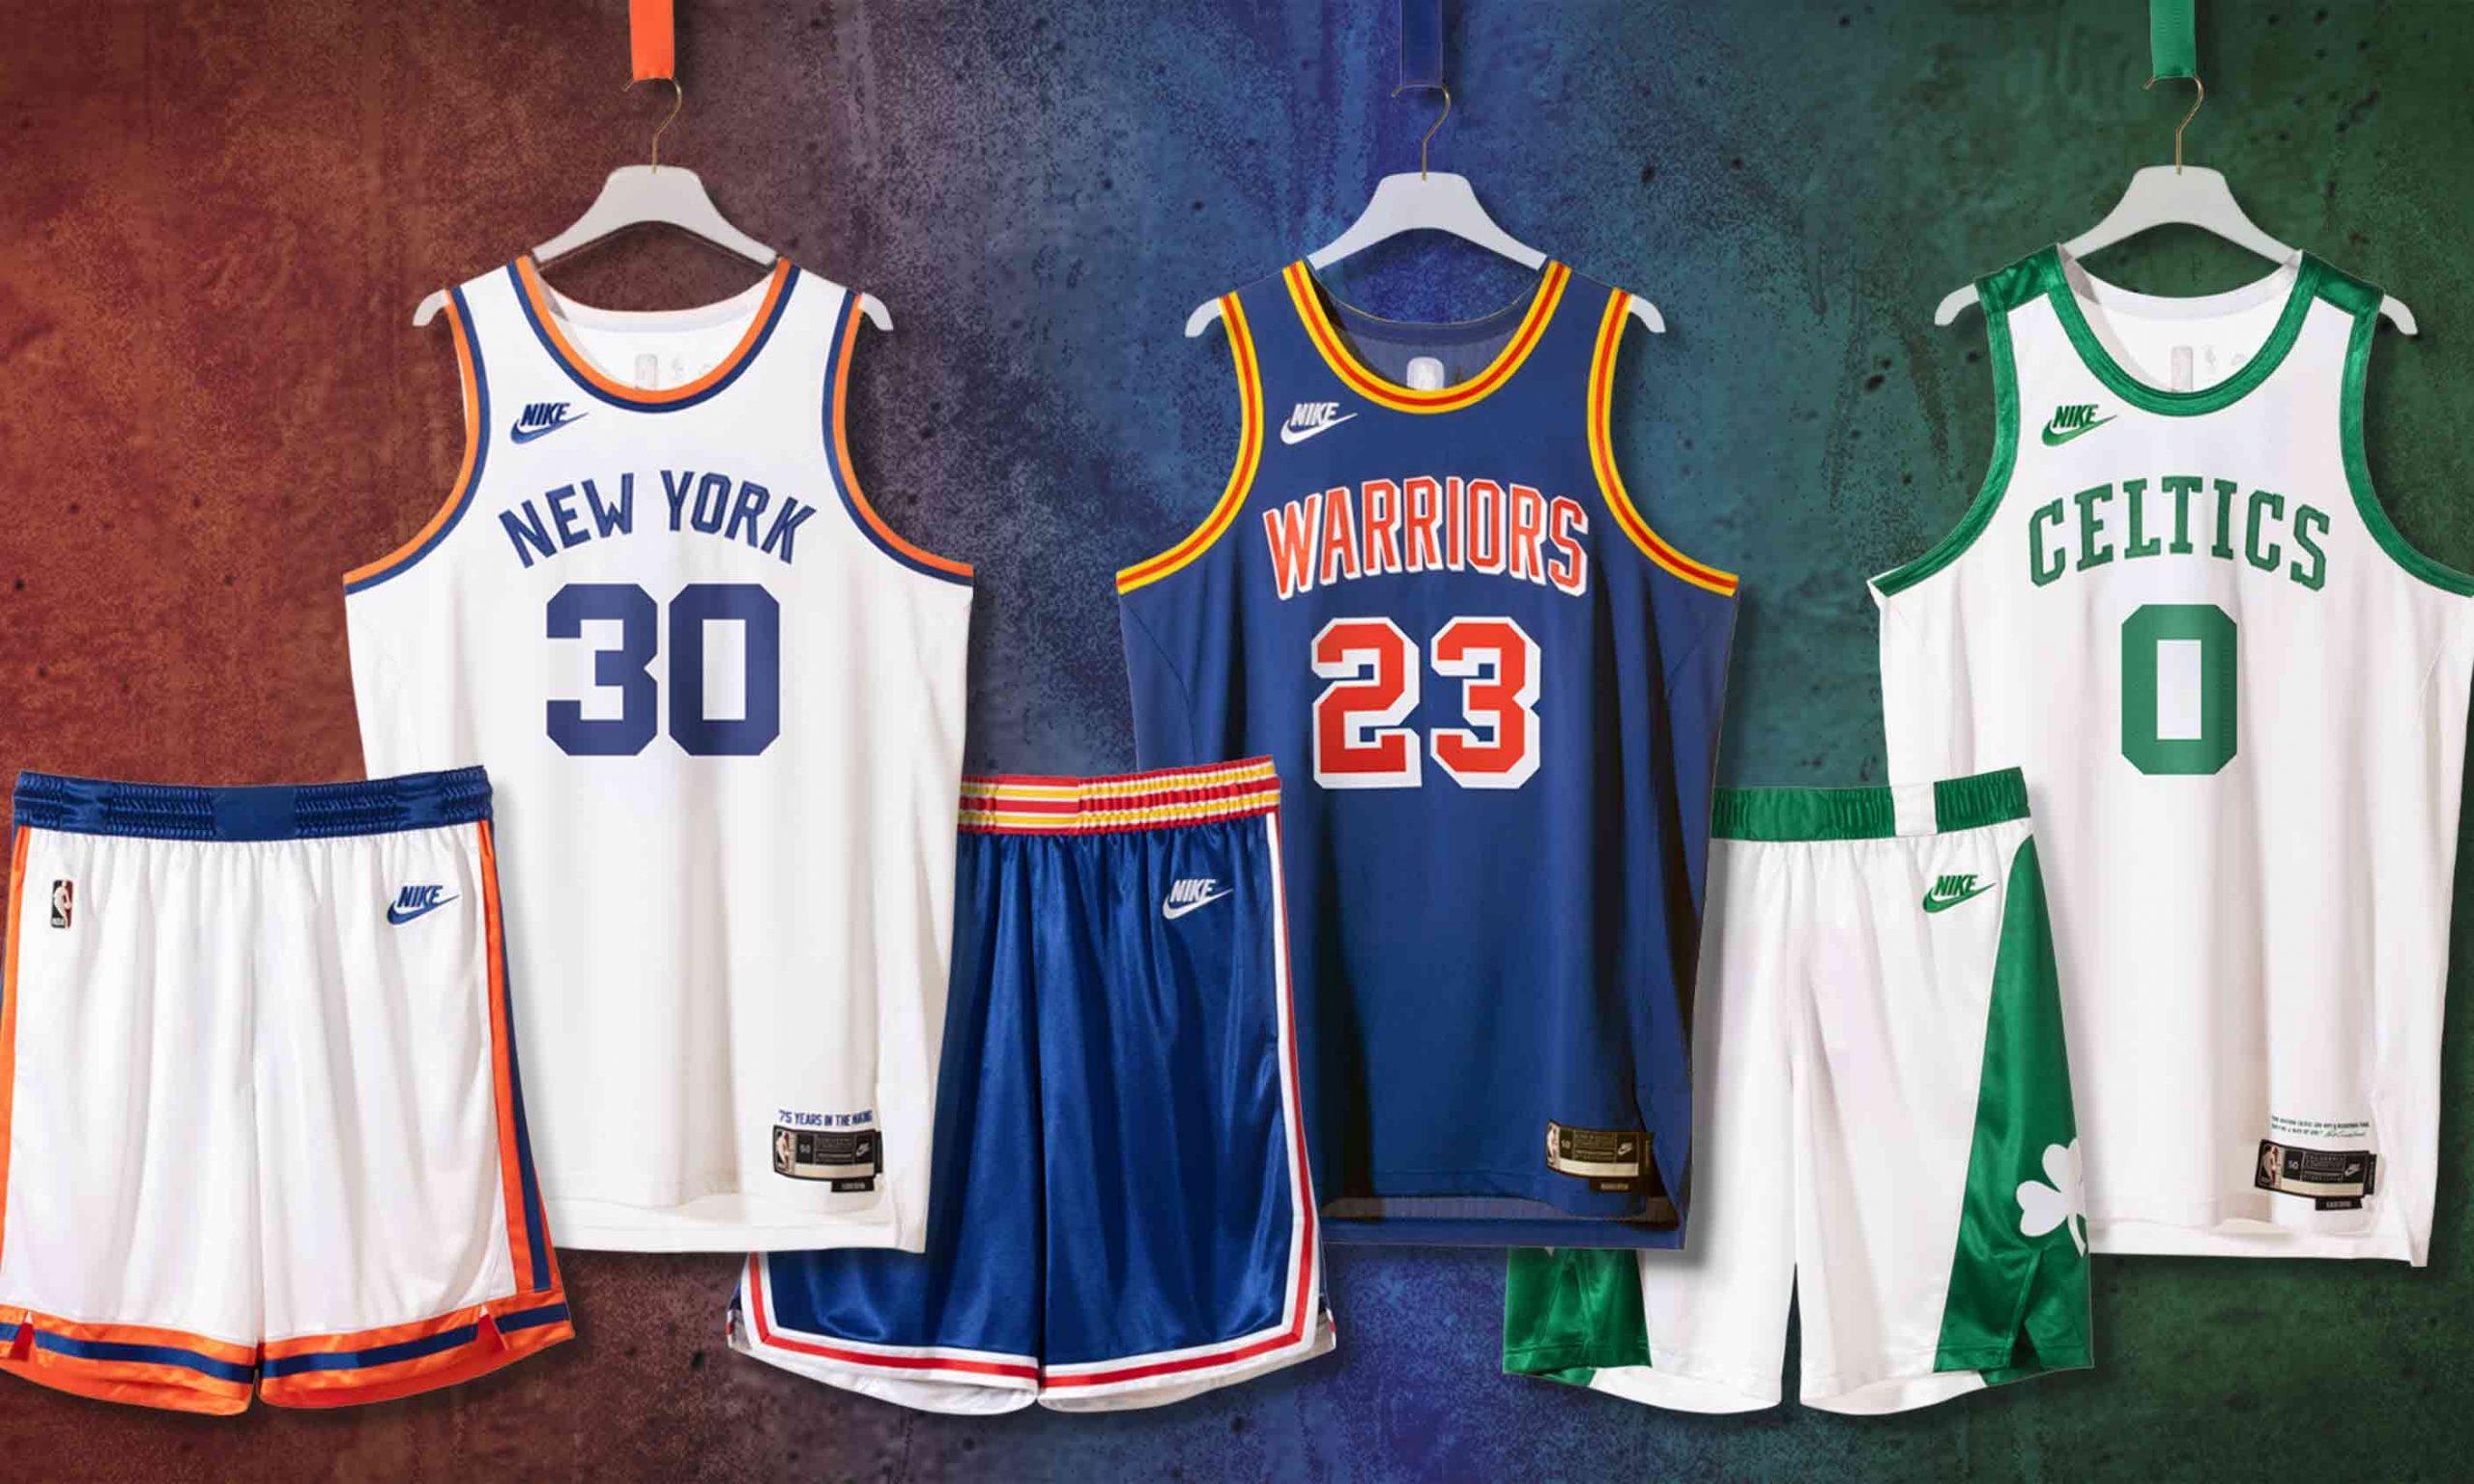 Nike 为 NBA 创立 75 周年特别打造限定复古球衣